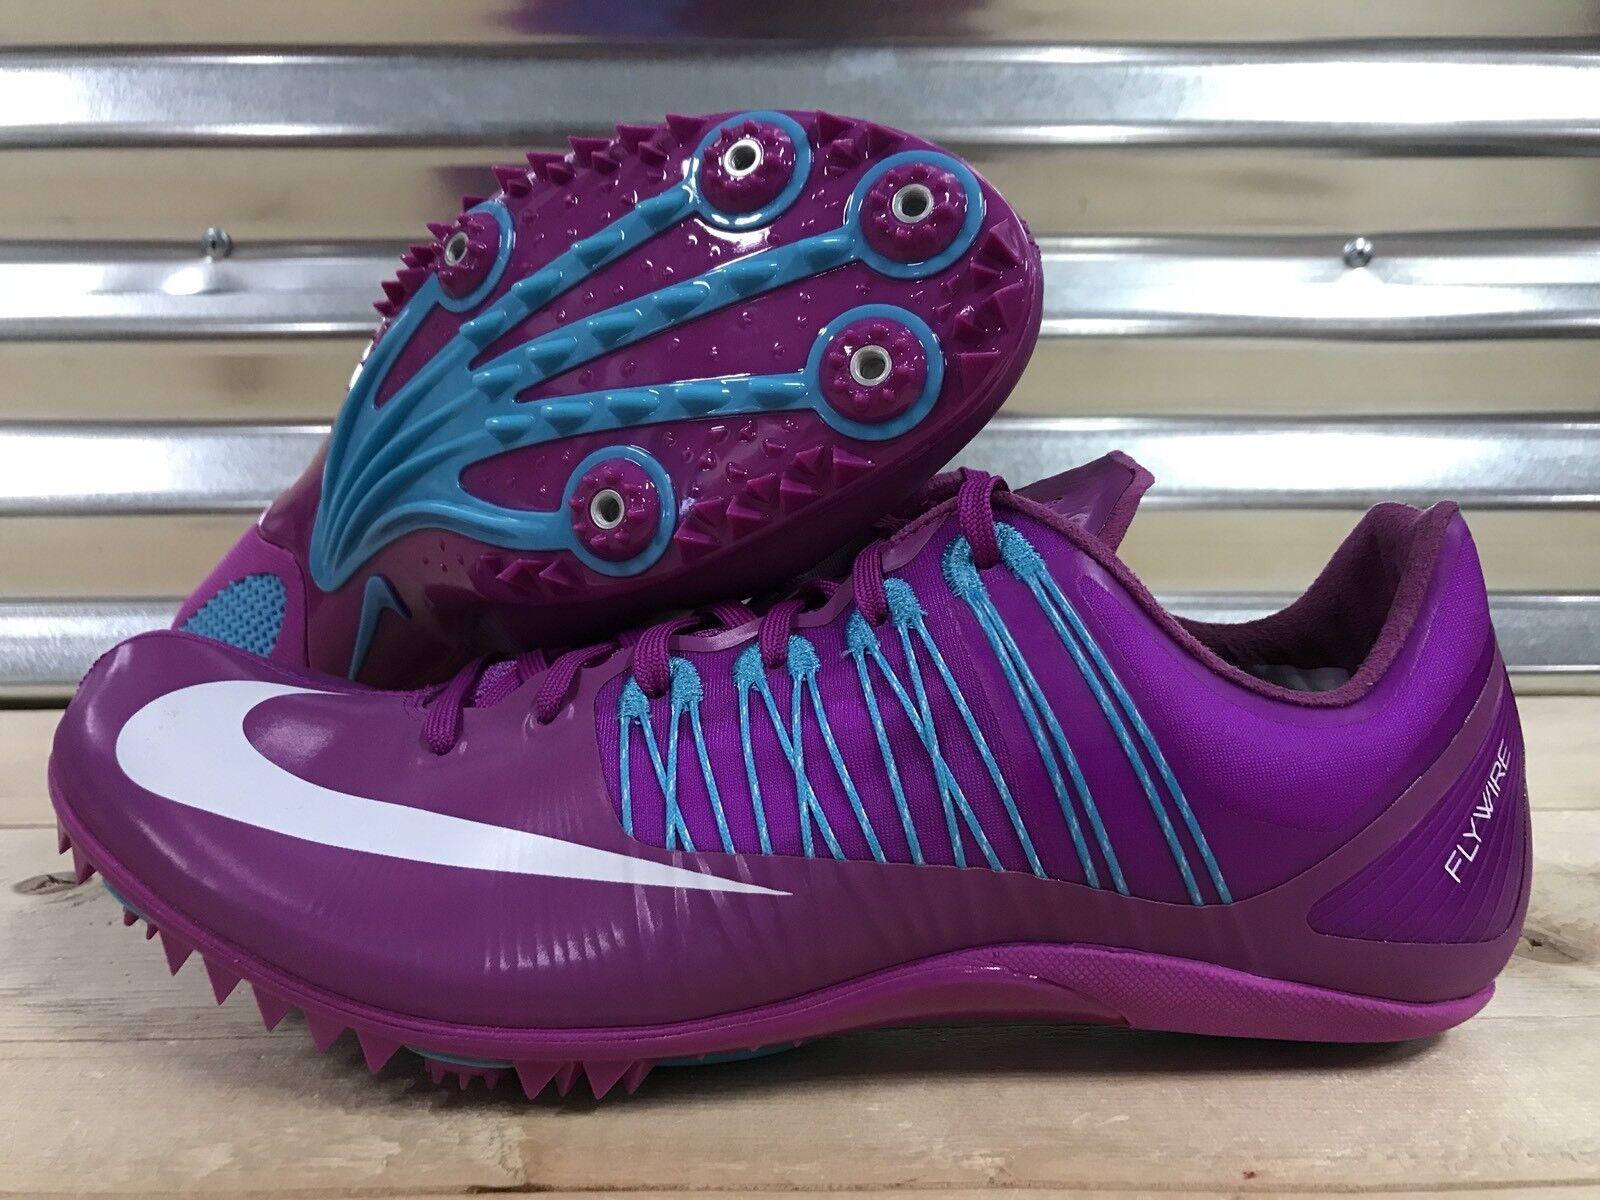 best sneakers 712aa 8b74d Nike Zoom Celar 5 Track   Field Sprint Spikes Violet Blue SZ ( 629226-514 )